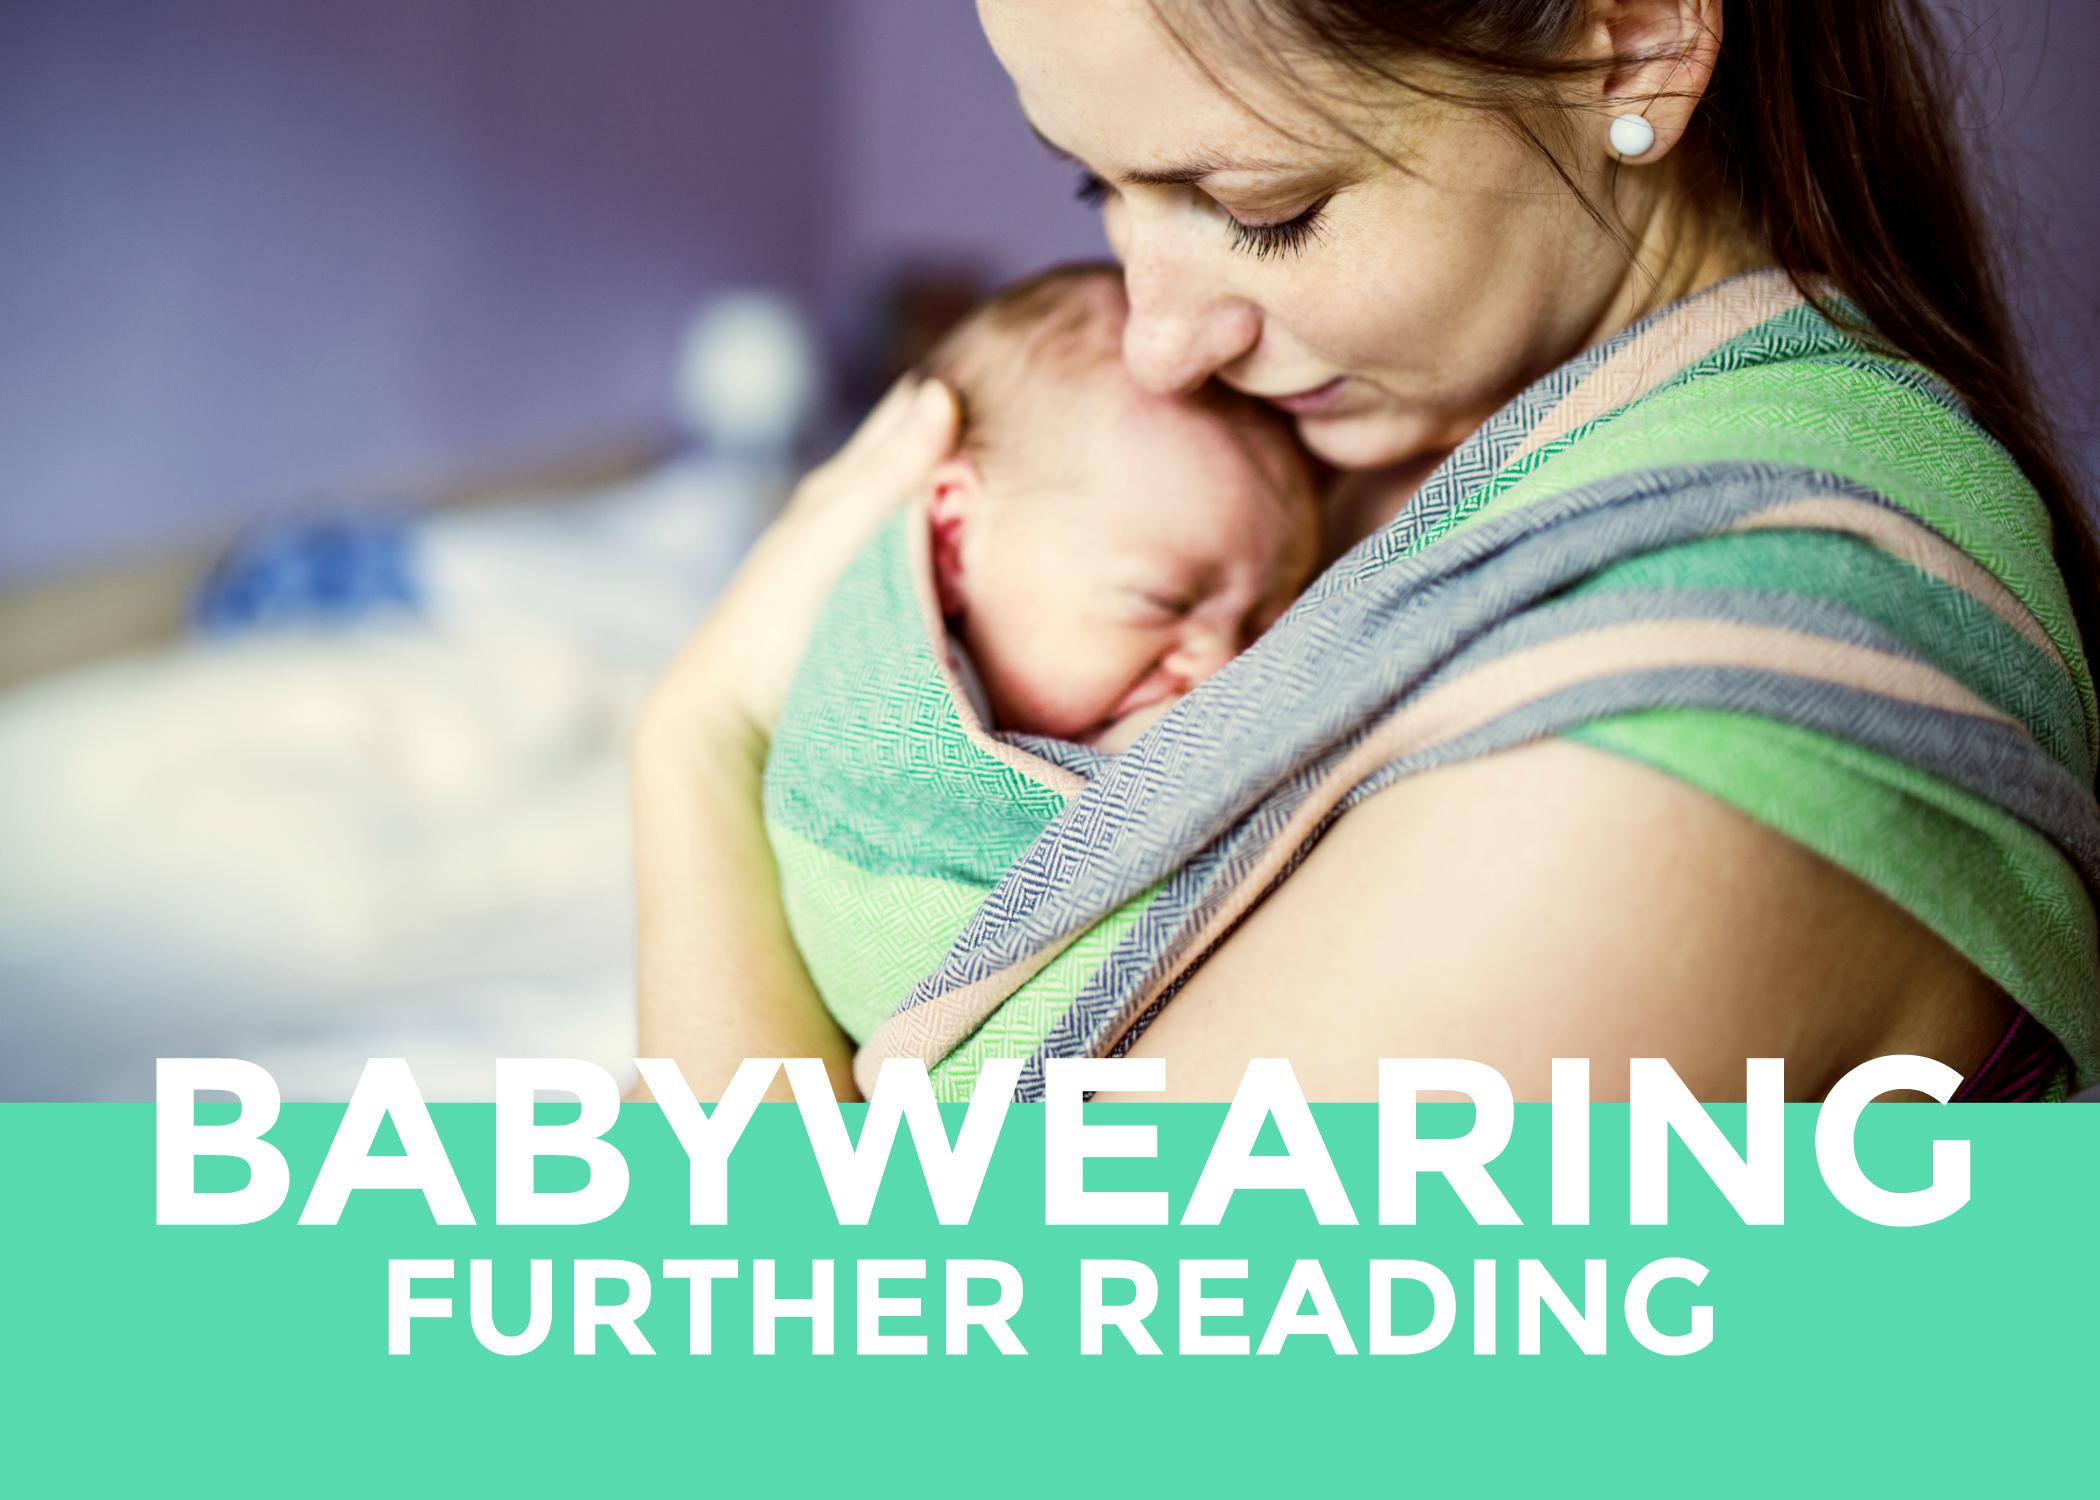 Island Carrier    Benefits of Babywearing